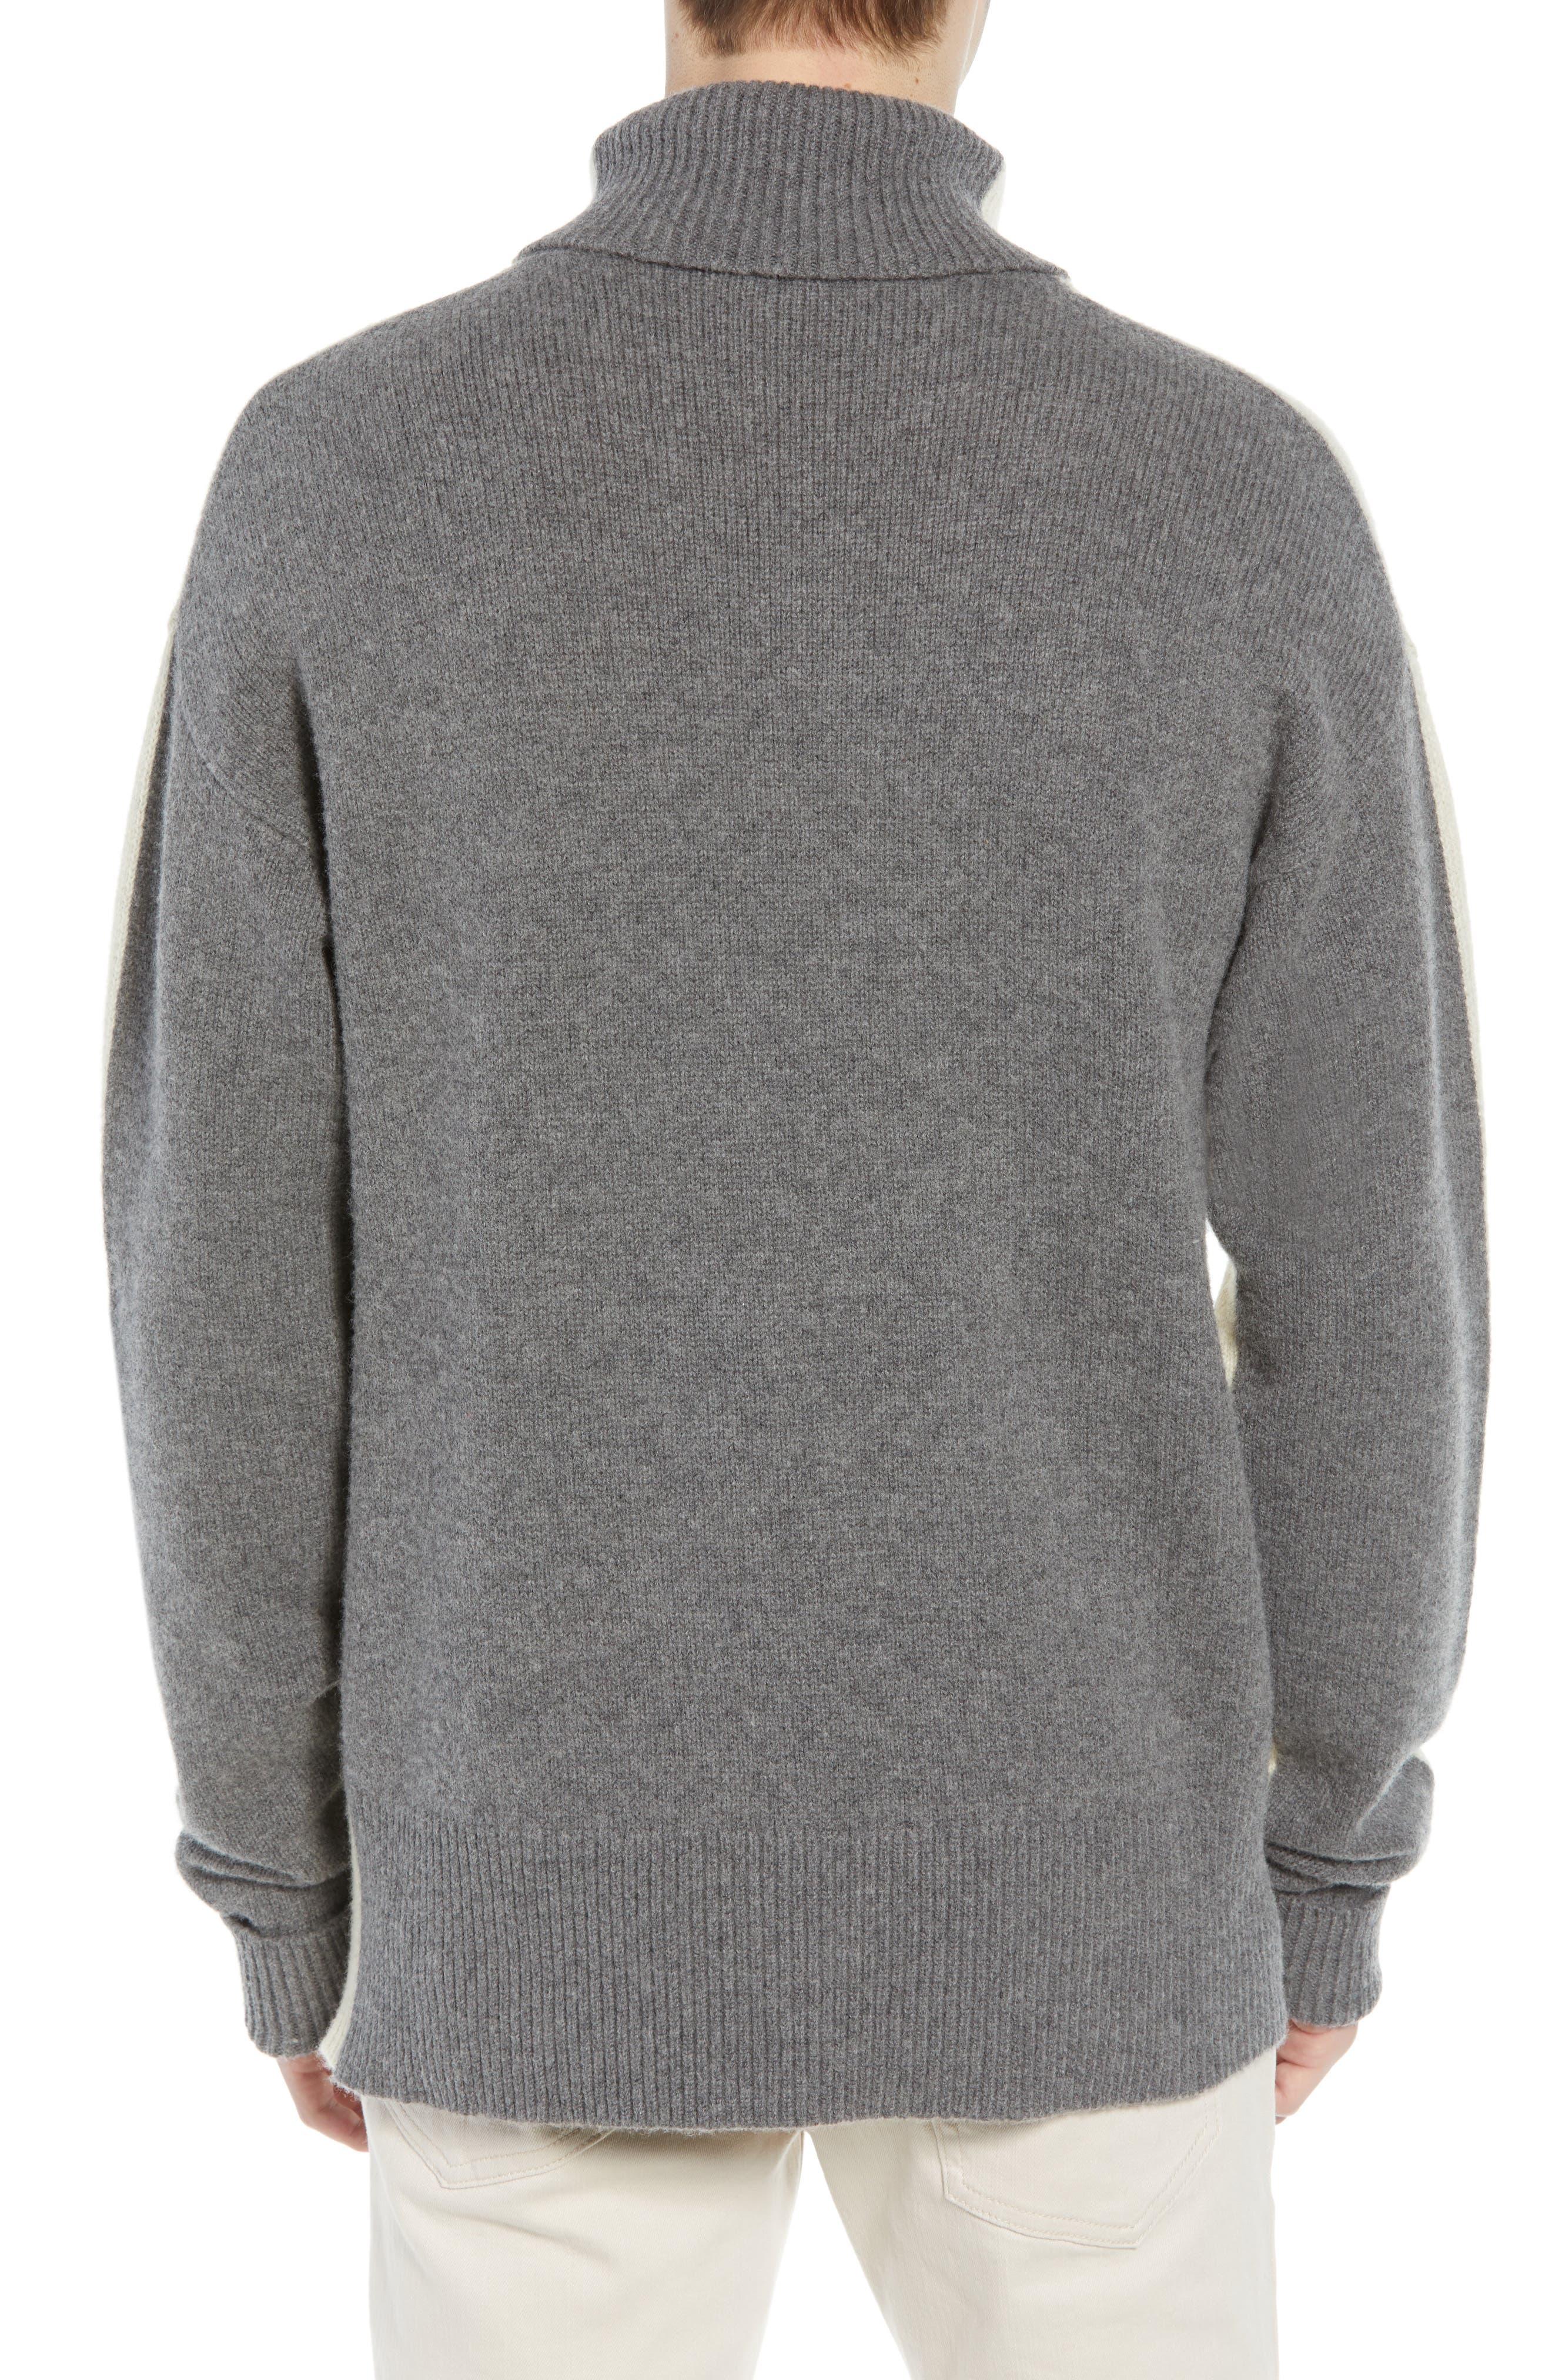 Colorblock Turtleneck Sweater,                             Alternate thumbnail 2, color,                             FOG MID GREY MELANGE